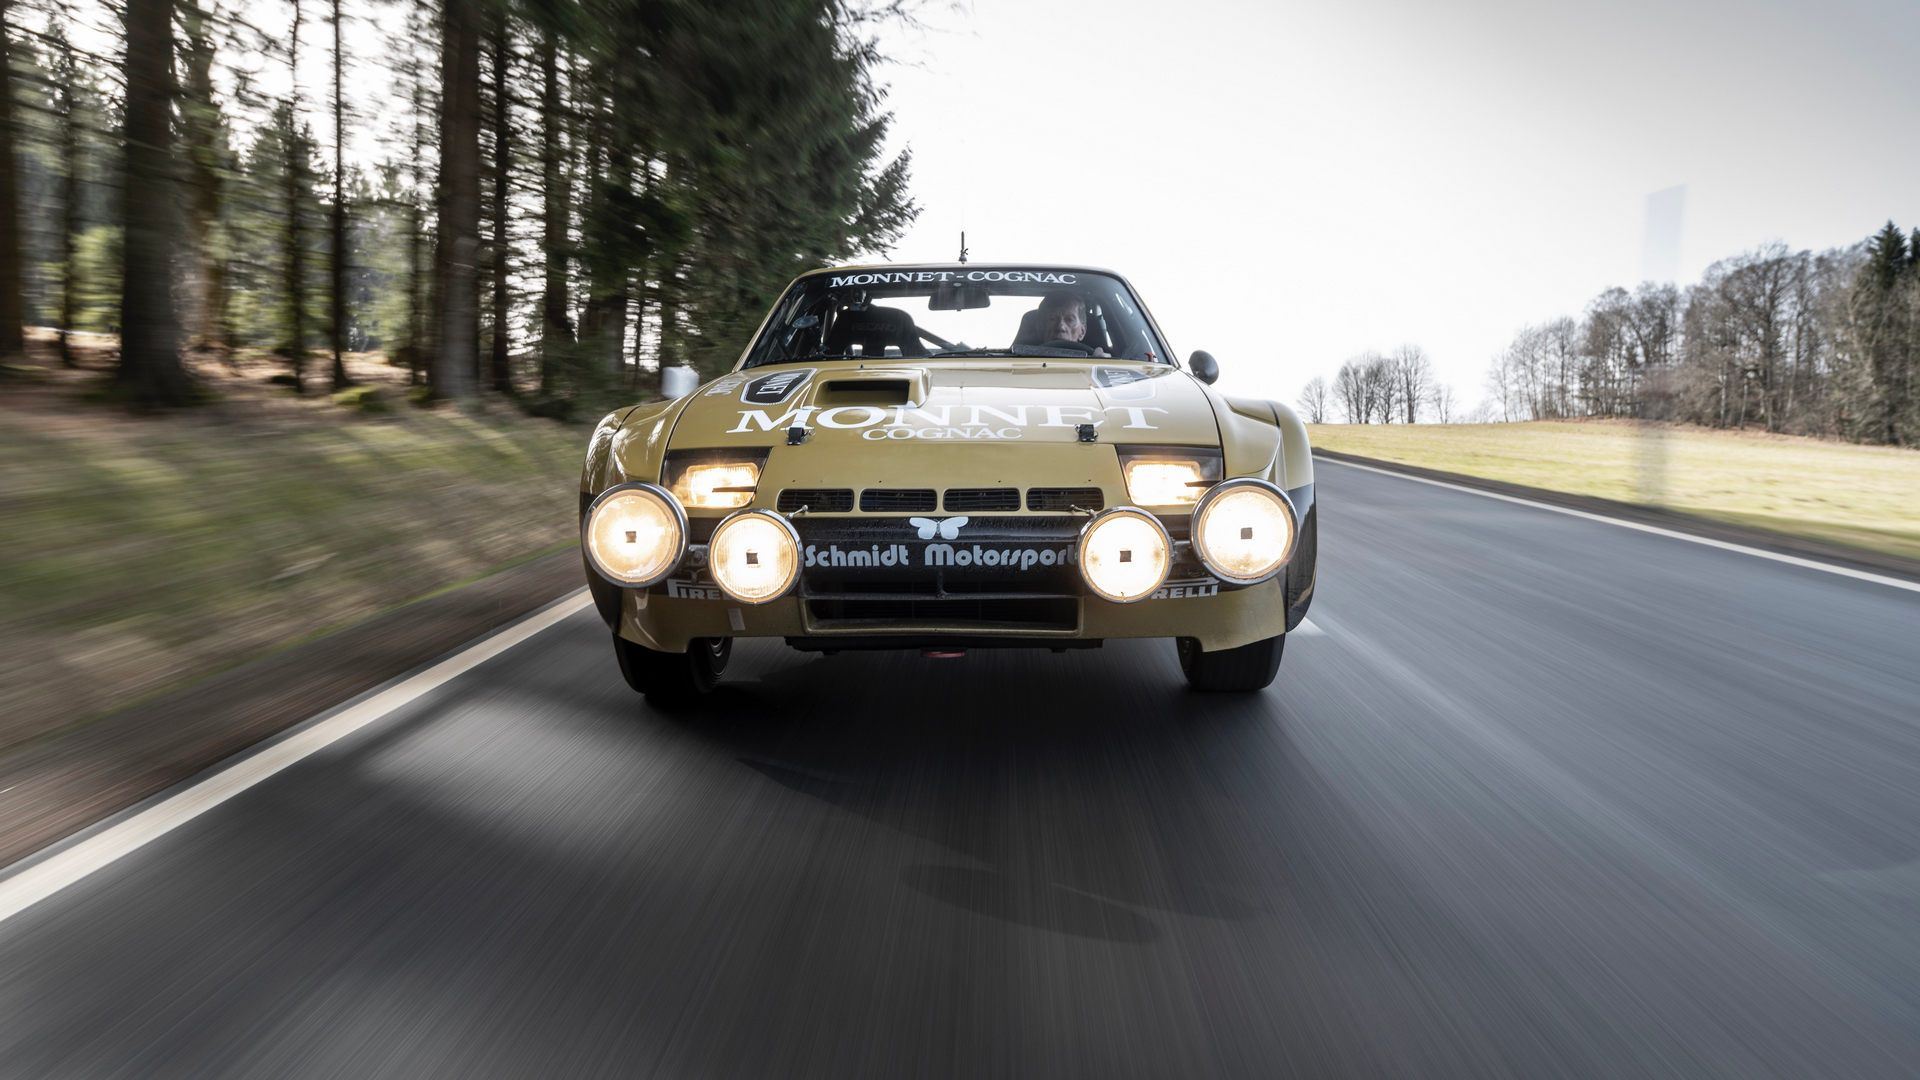 Porsche-924-Carrera-GTS-rally-car-Walter-Rohrl-8